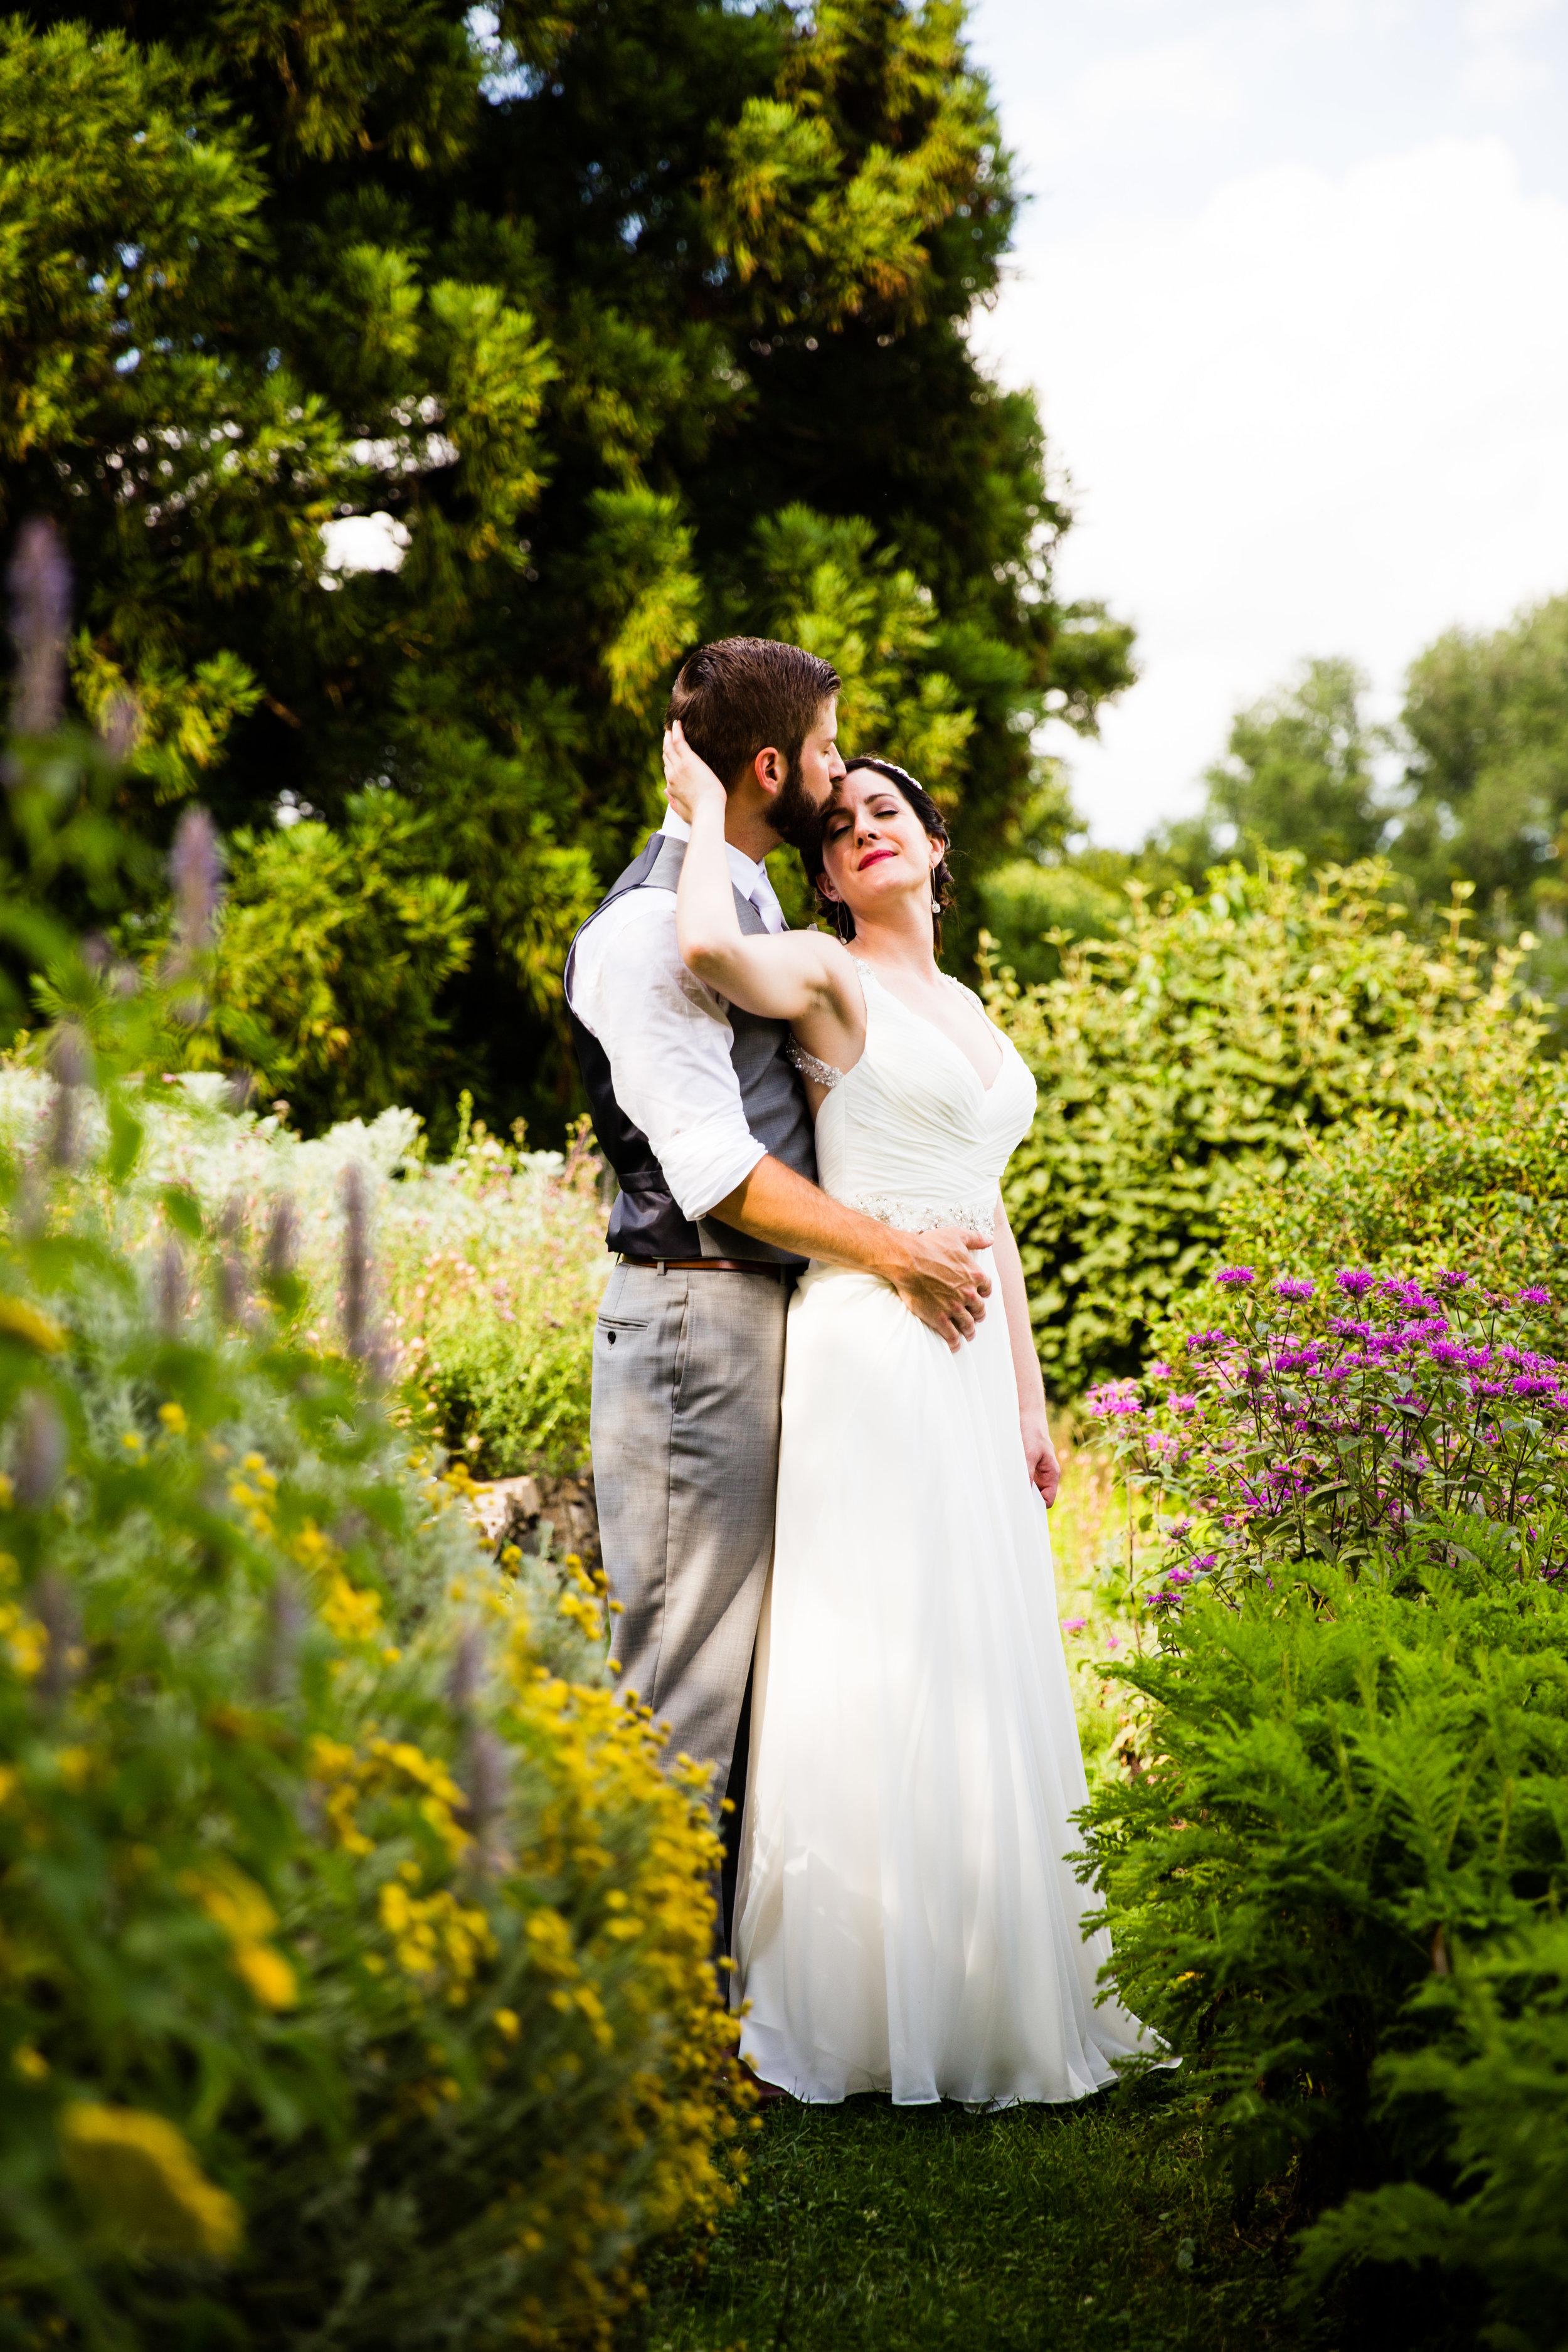 TYLER ARBORETUM WEDDING PHOTOGRAPHY LOVESTRUCK PICTURES-038.jpg